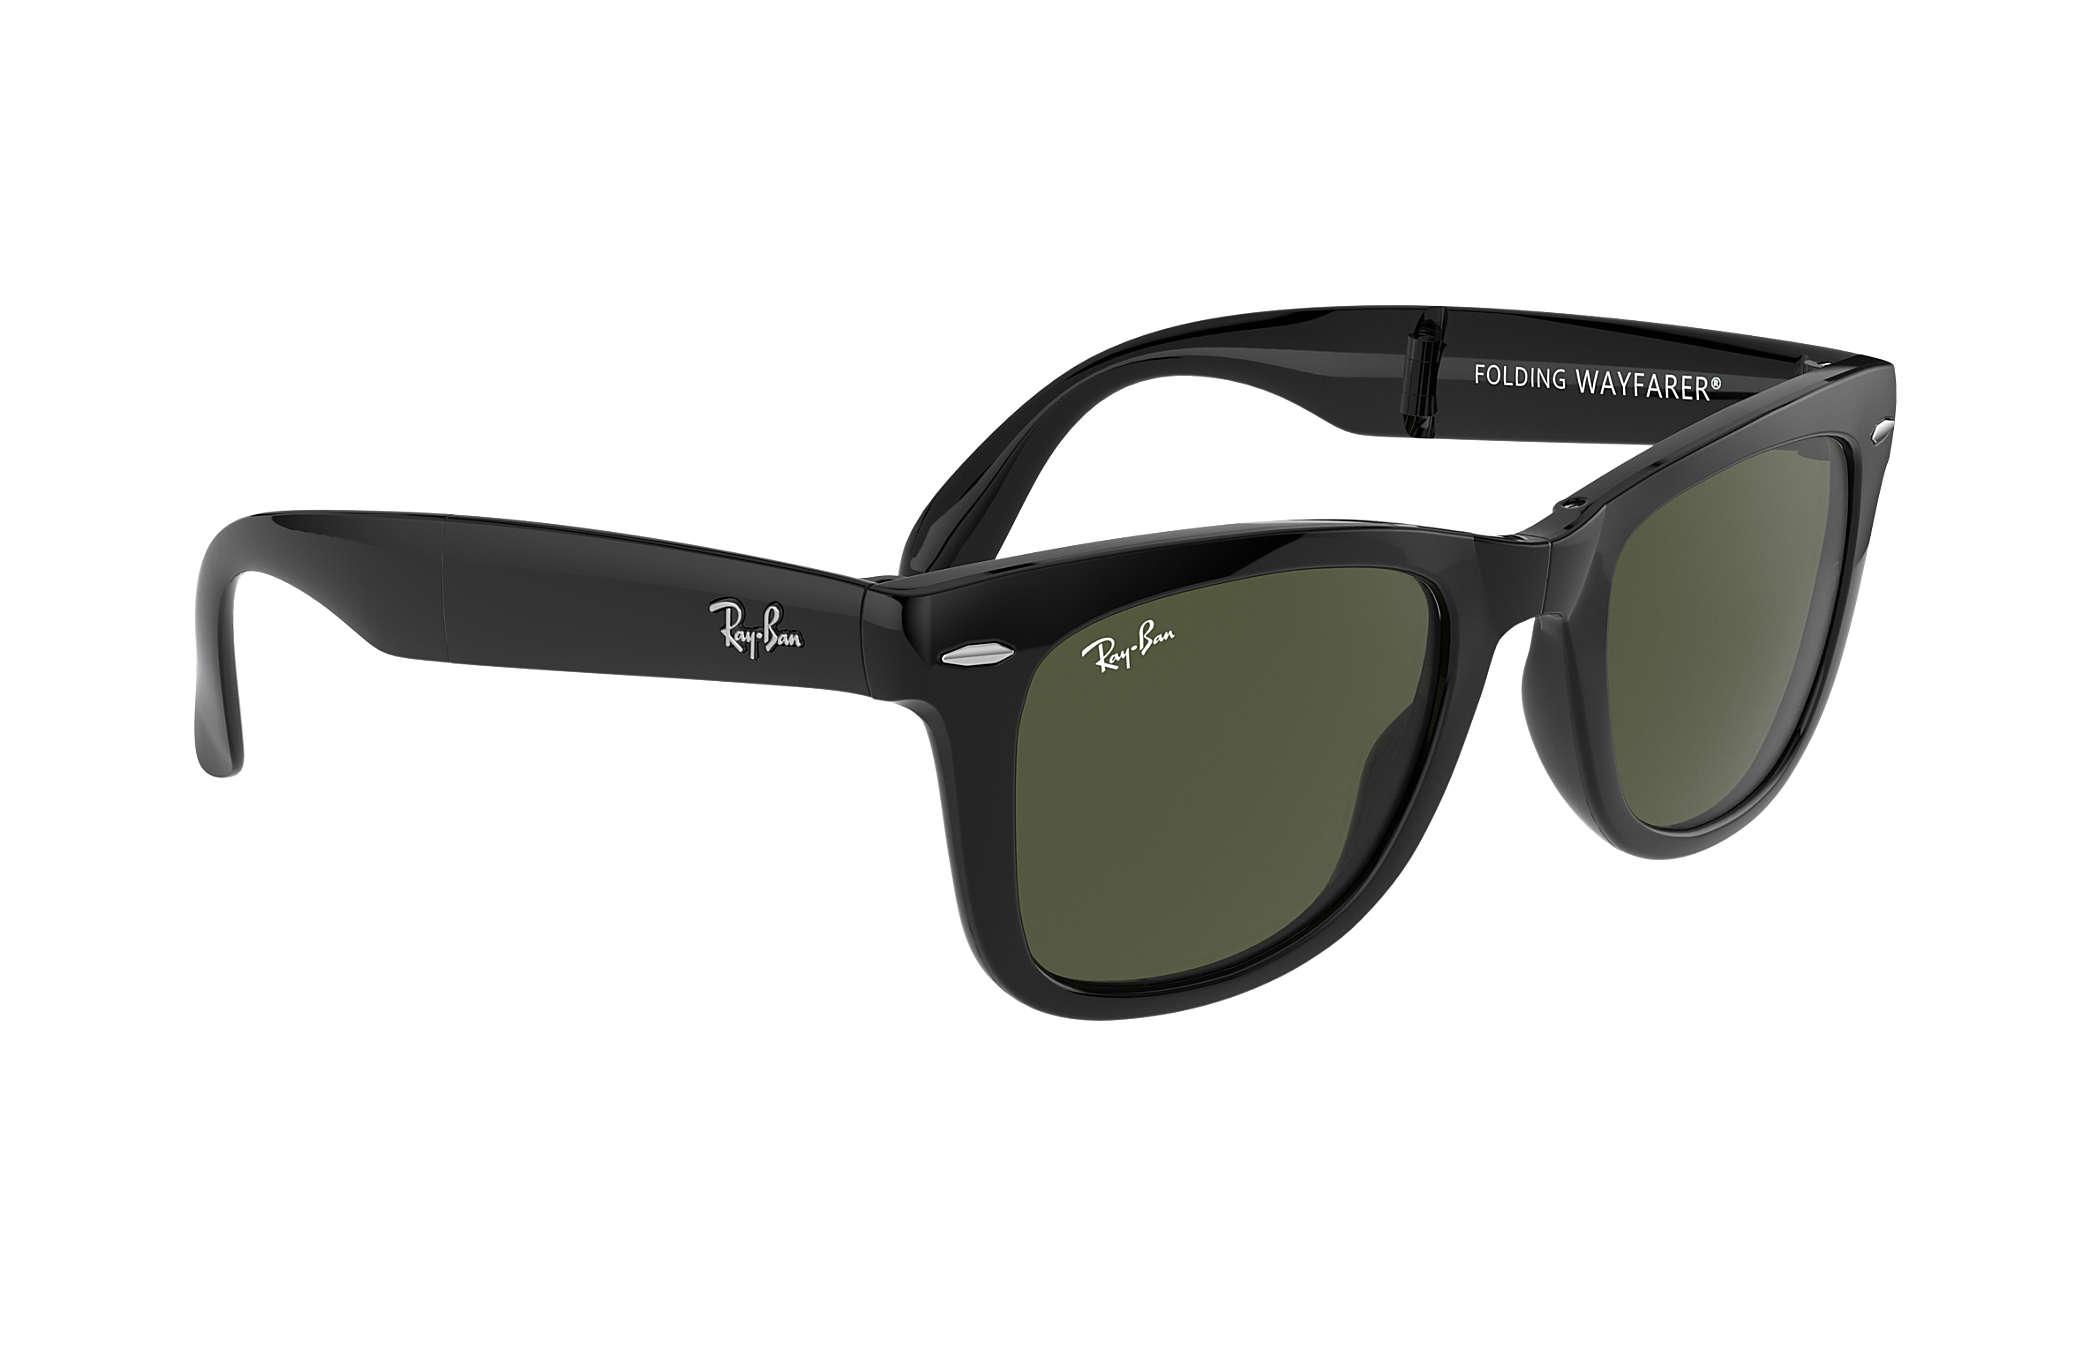 814ec301b11ff Ray-Ban Wayfarer Folding Classic RB4105 Black - Nylon - Green Lenses ...